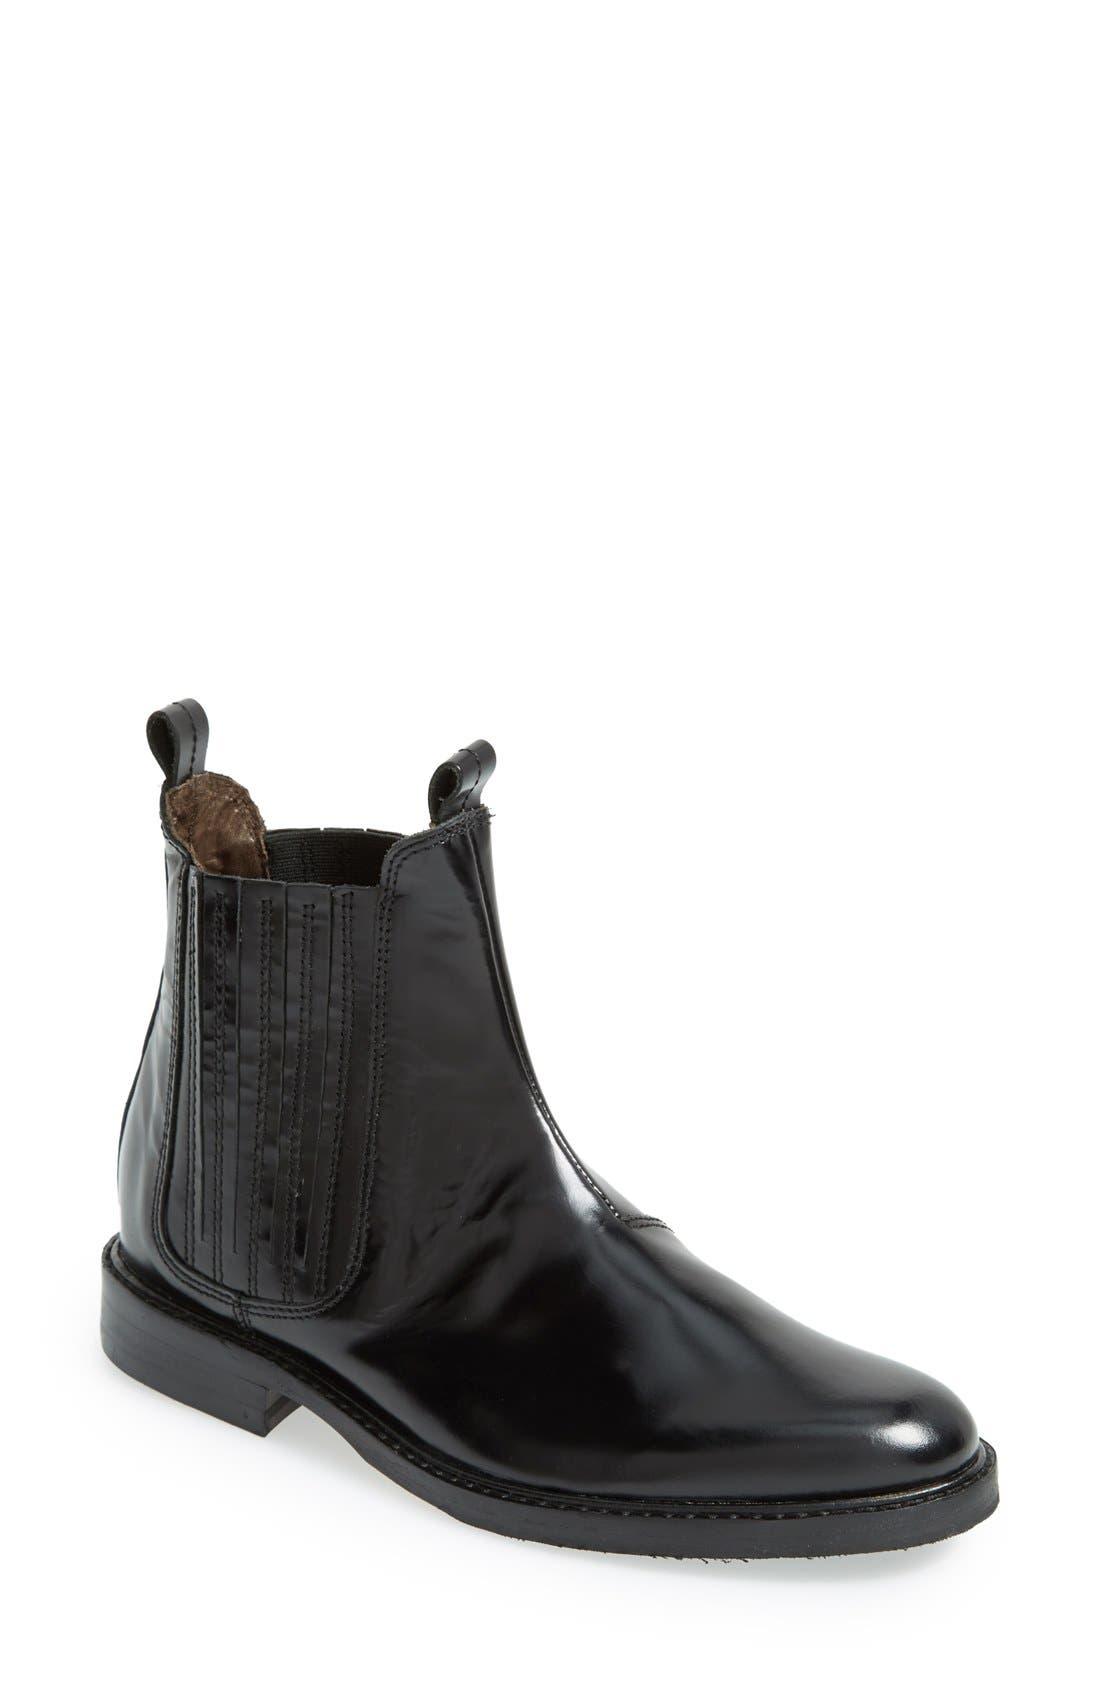 Main Image - H by Hudson 'Tafler' Leather Chelsea Boot (Women)